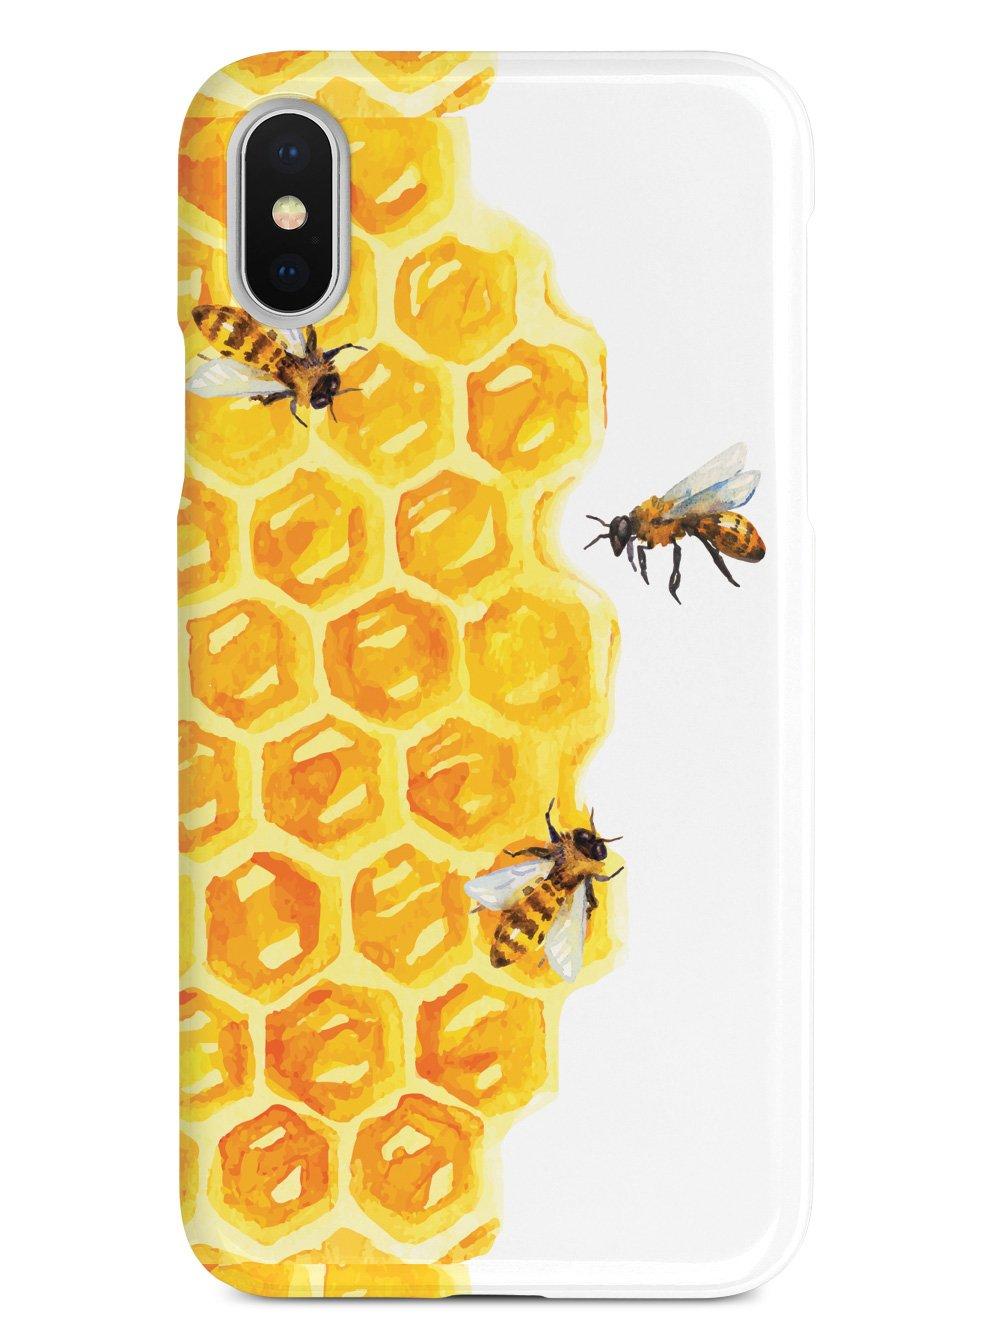 Watercolor Honeycomb At Getdrawings